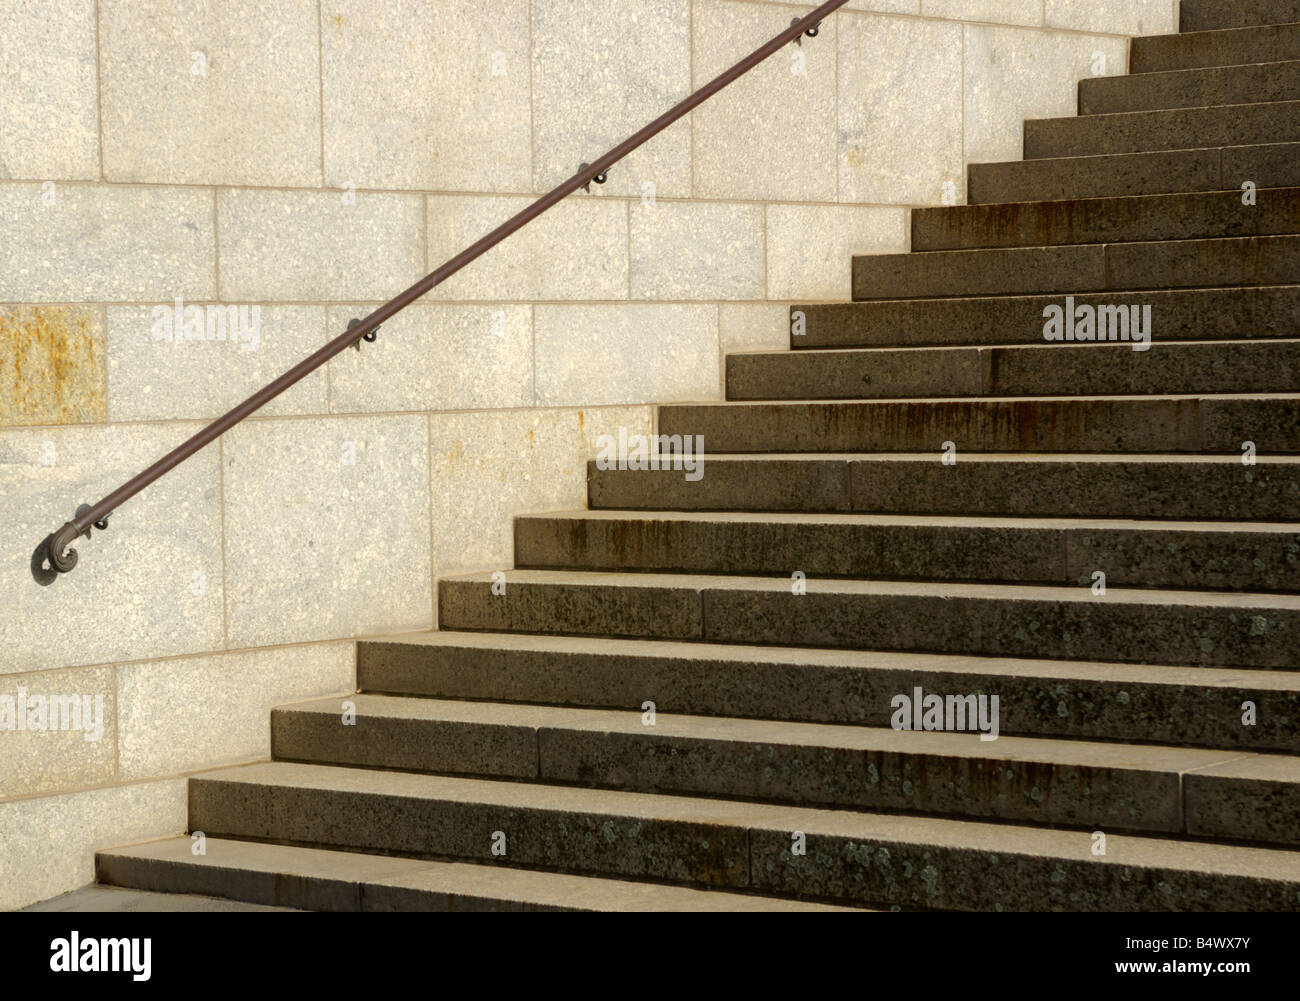 Stone steps at the Shrine of Remembrance, Melbourne, Australia. - Stock Image